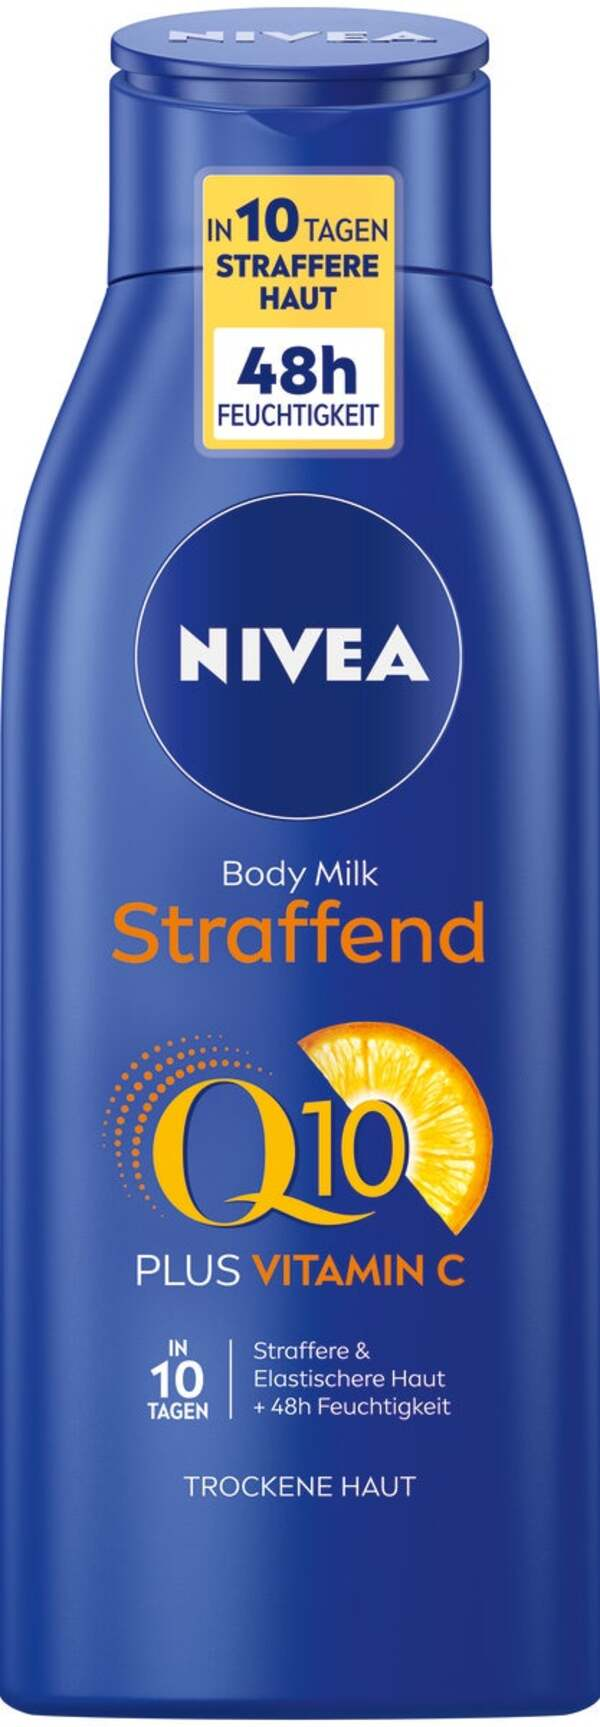 NIVEA              Q10 energy+ Hautstraffende Body Milk